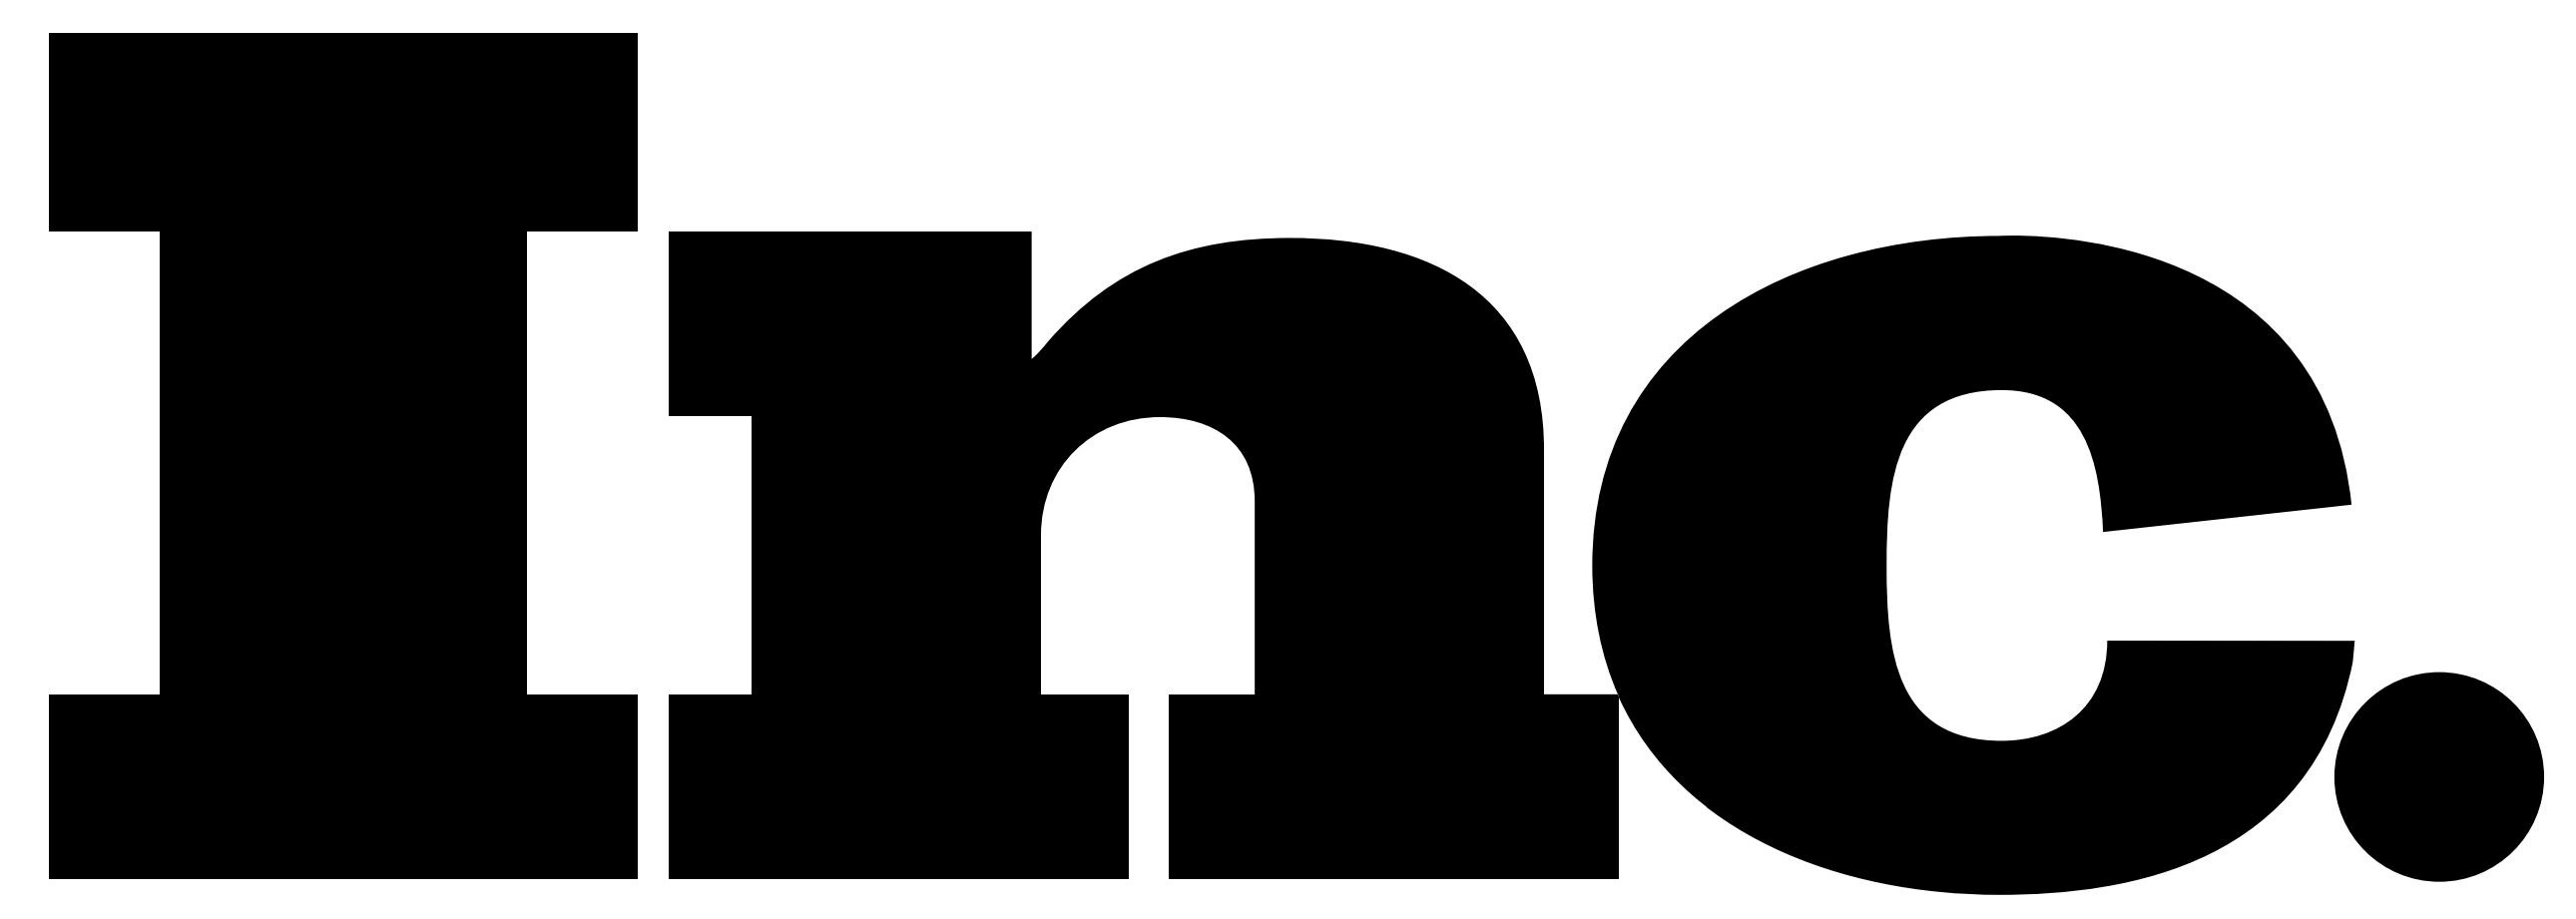 Fileinc magazine logog wikimedia commons fileinc magazine logog buycottarizona Image collections